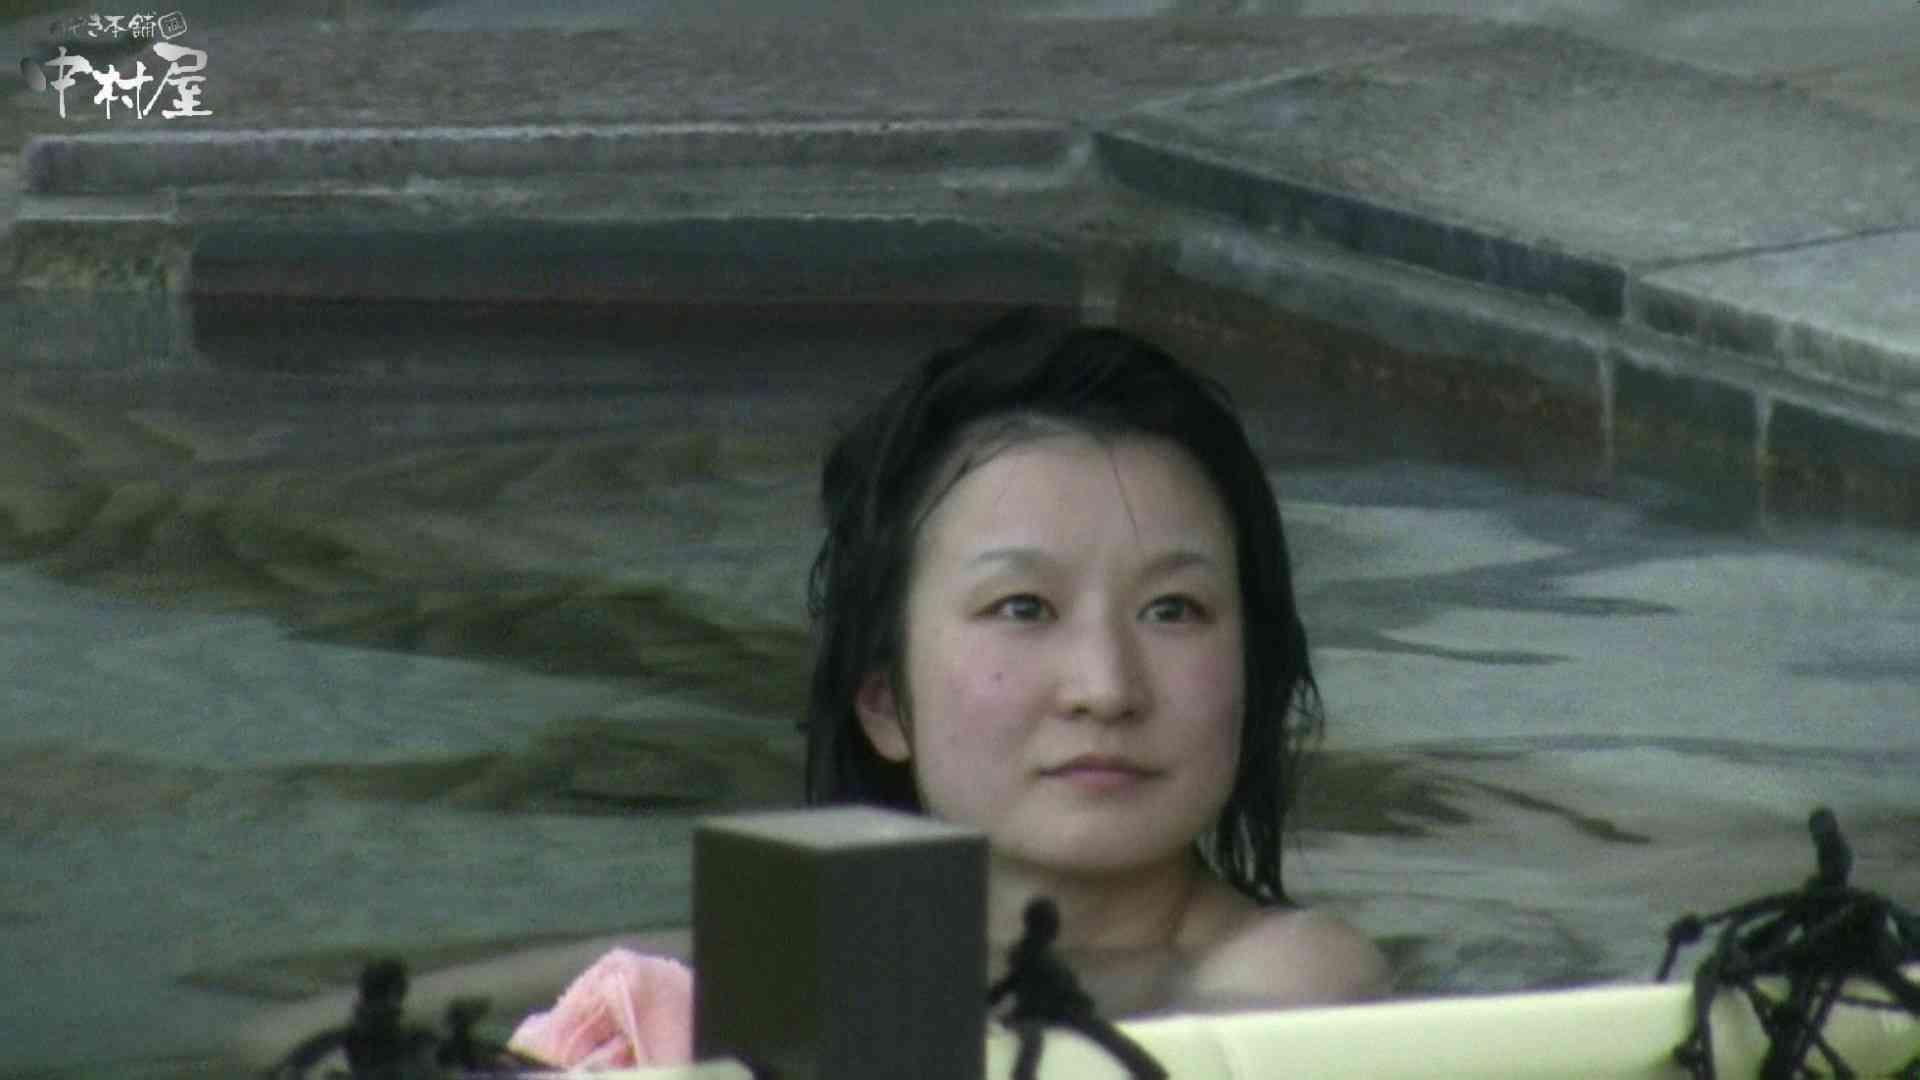 Aquaな露天風呂Vol.982 露天風呂編  78PIX 34